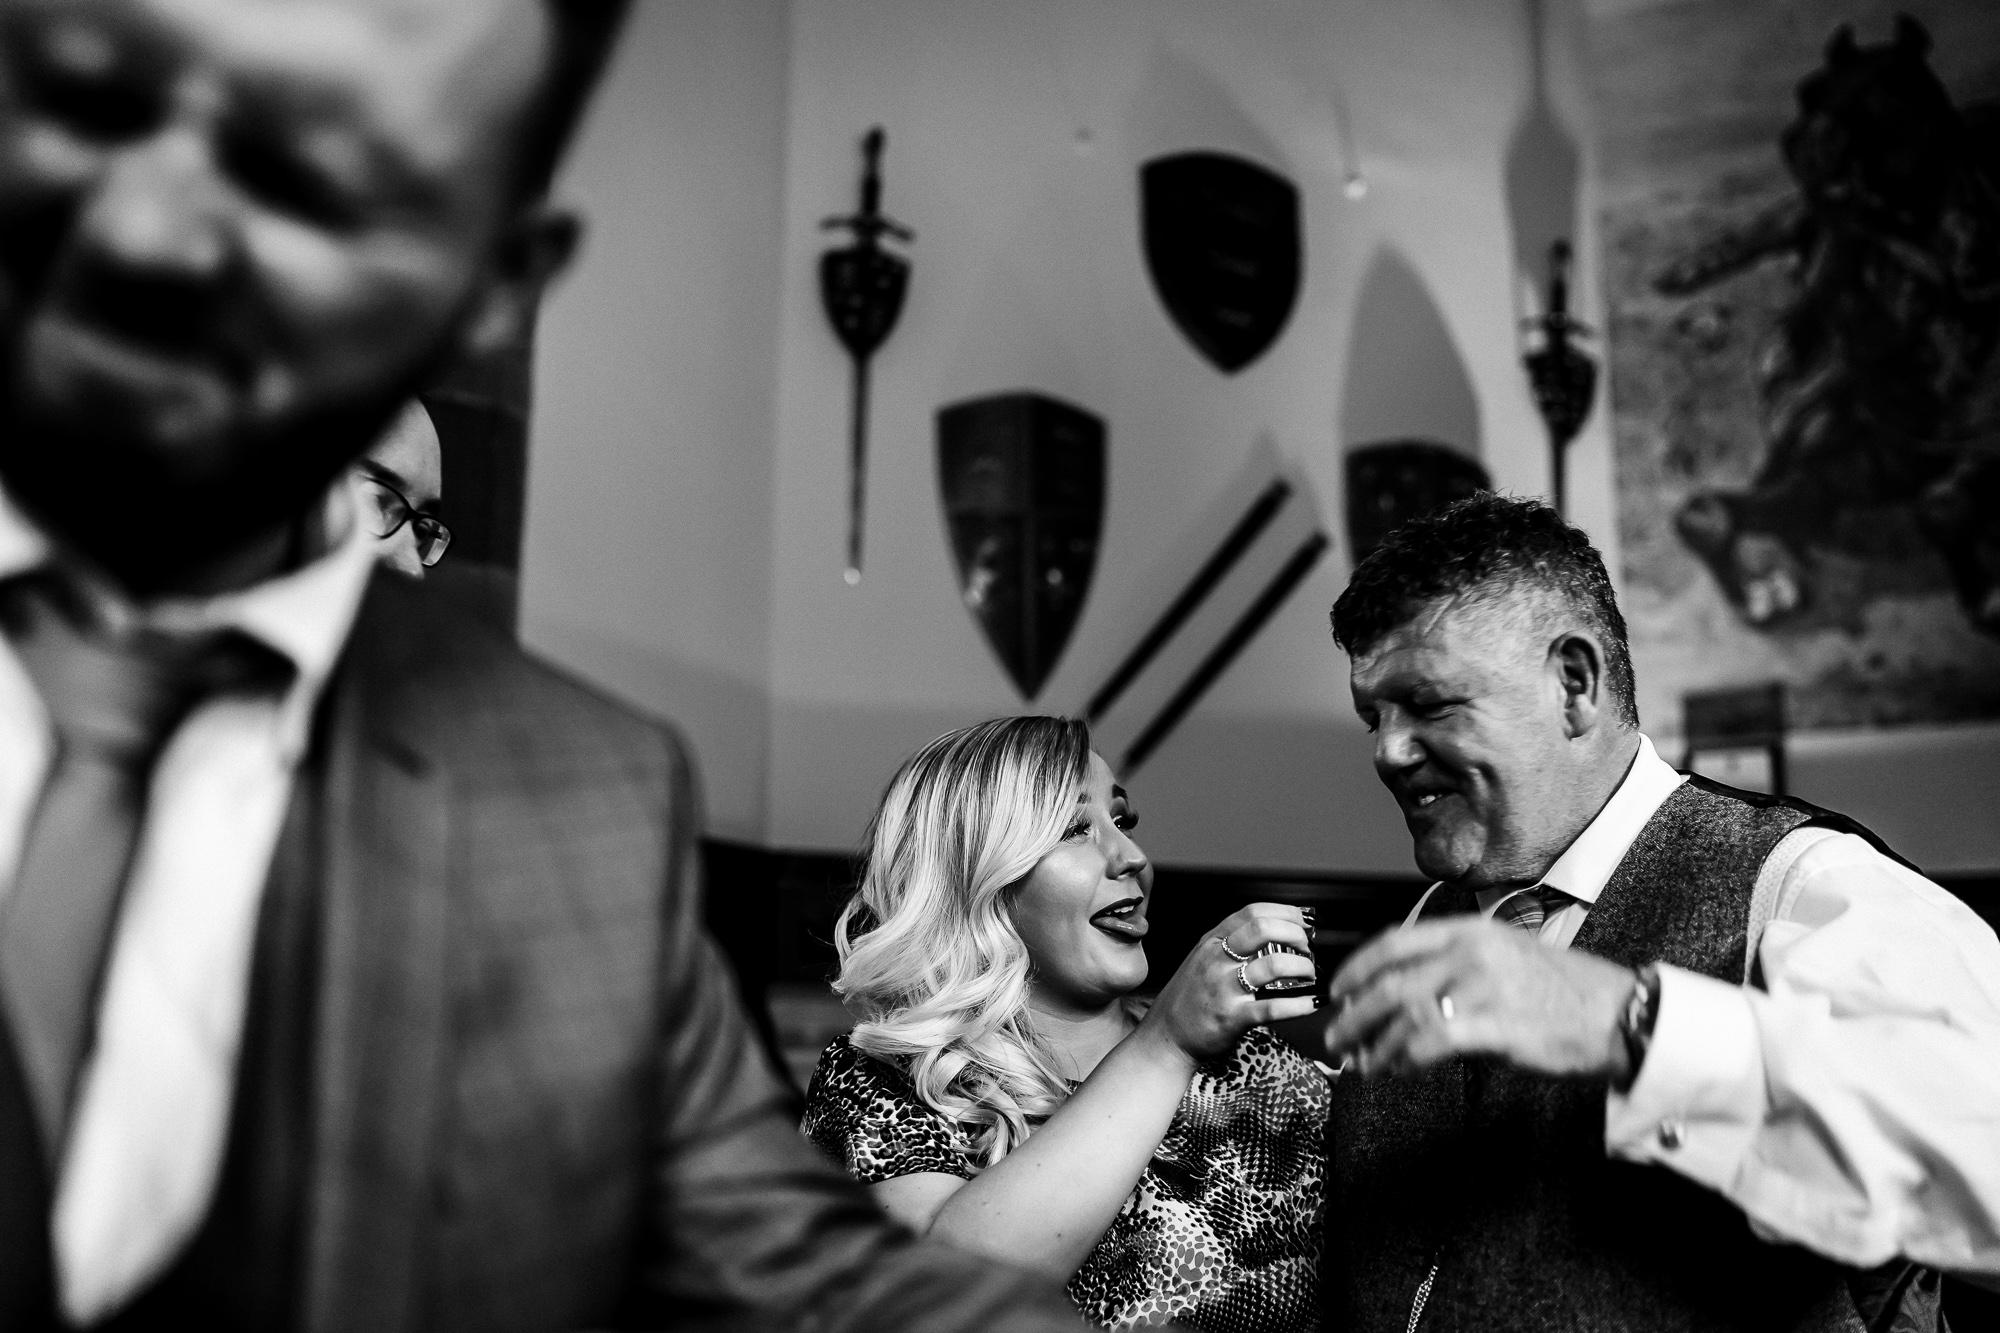 Peckforton Castle wedding photography cheshire wedding photographer (50 of 57).jpg